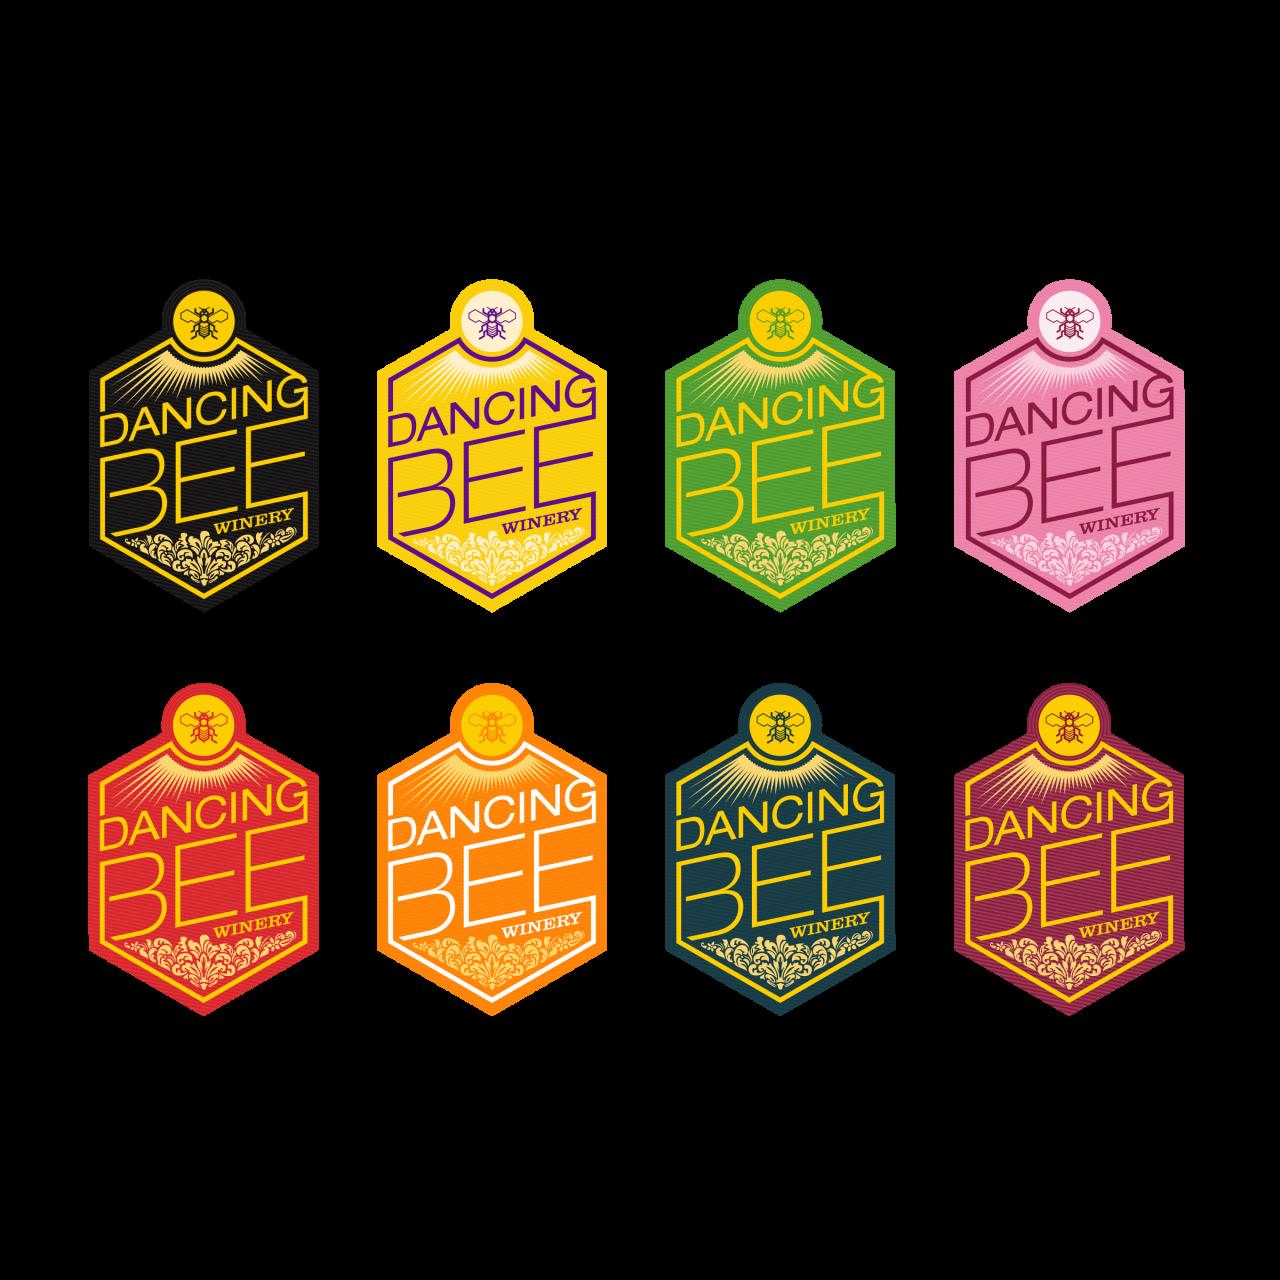 Image of Dancing Bee Winery logo color series